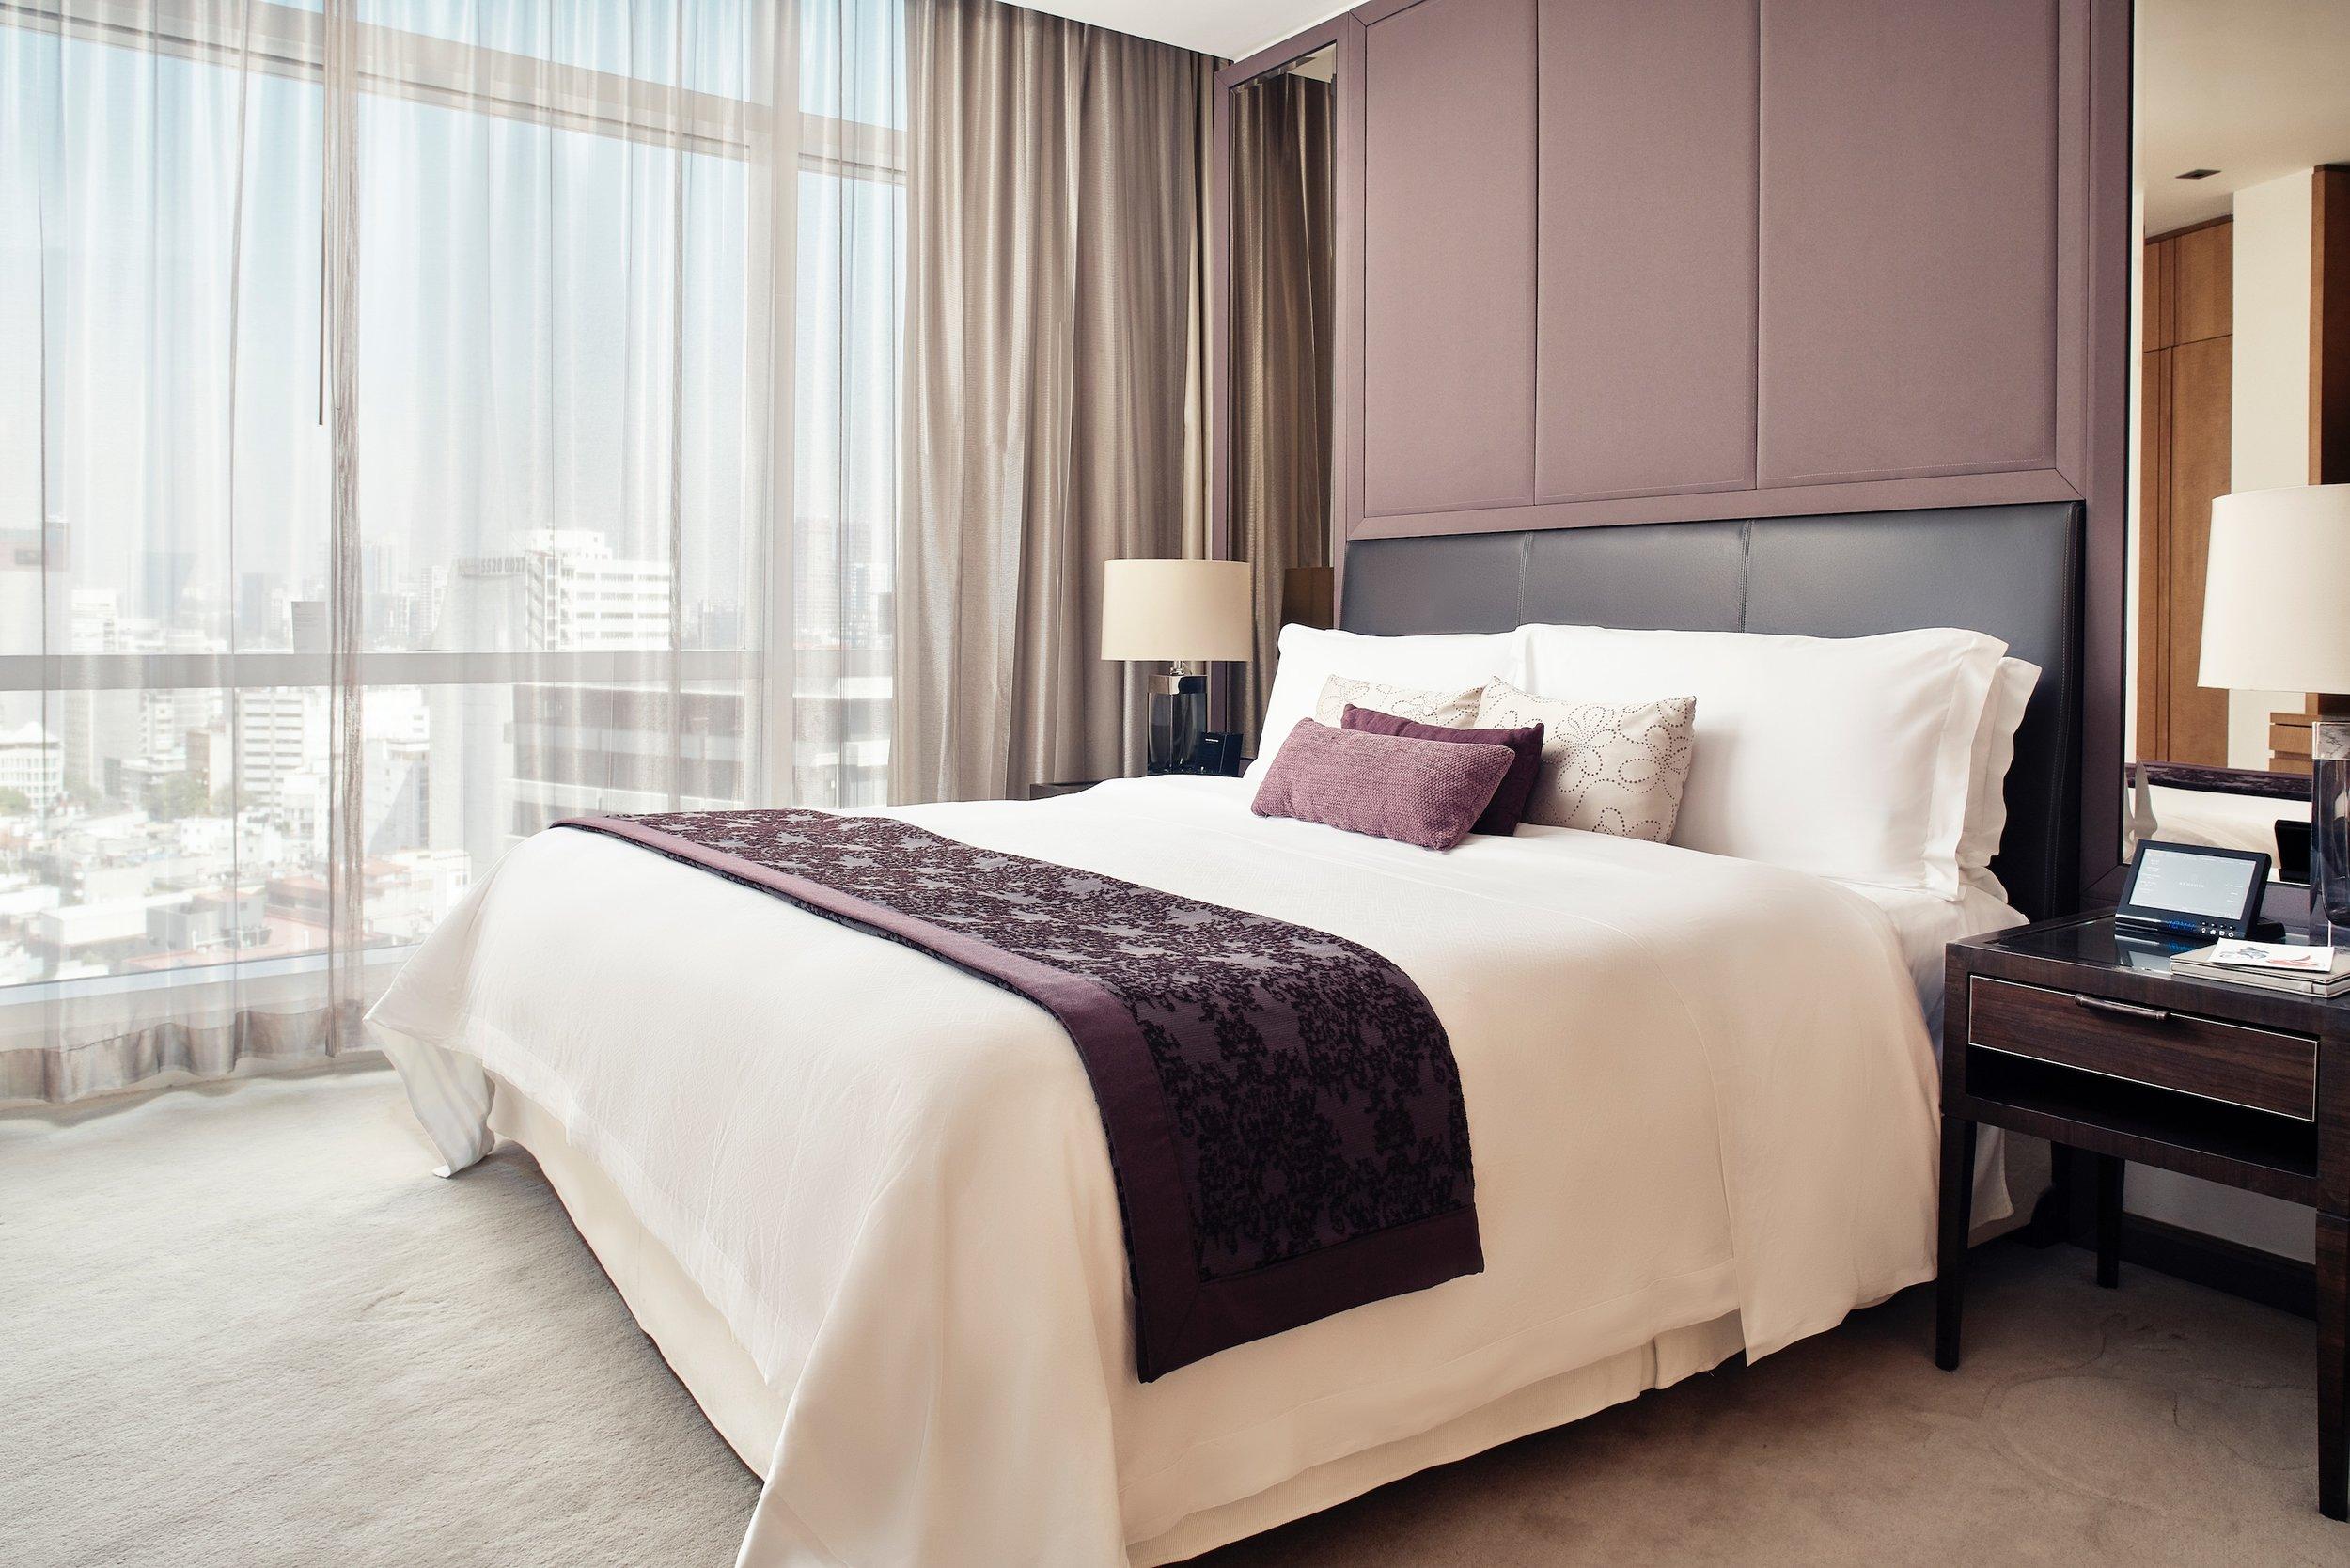 STR_MEXXR_guestroom_executive_suite_bed.jpg